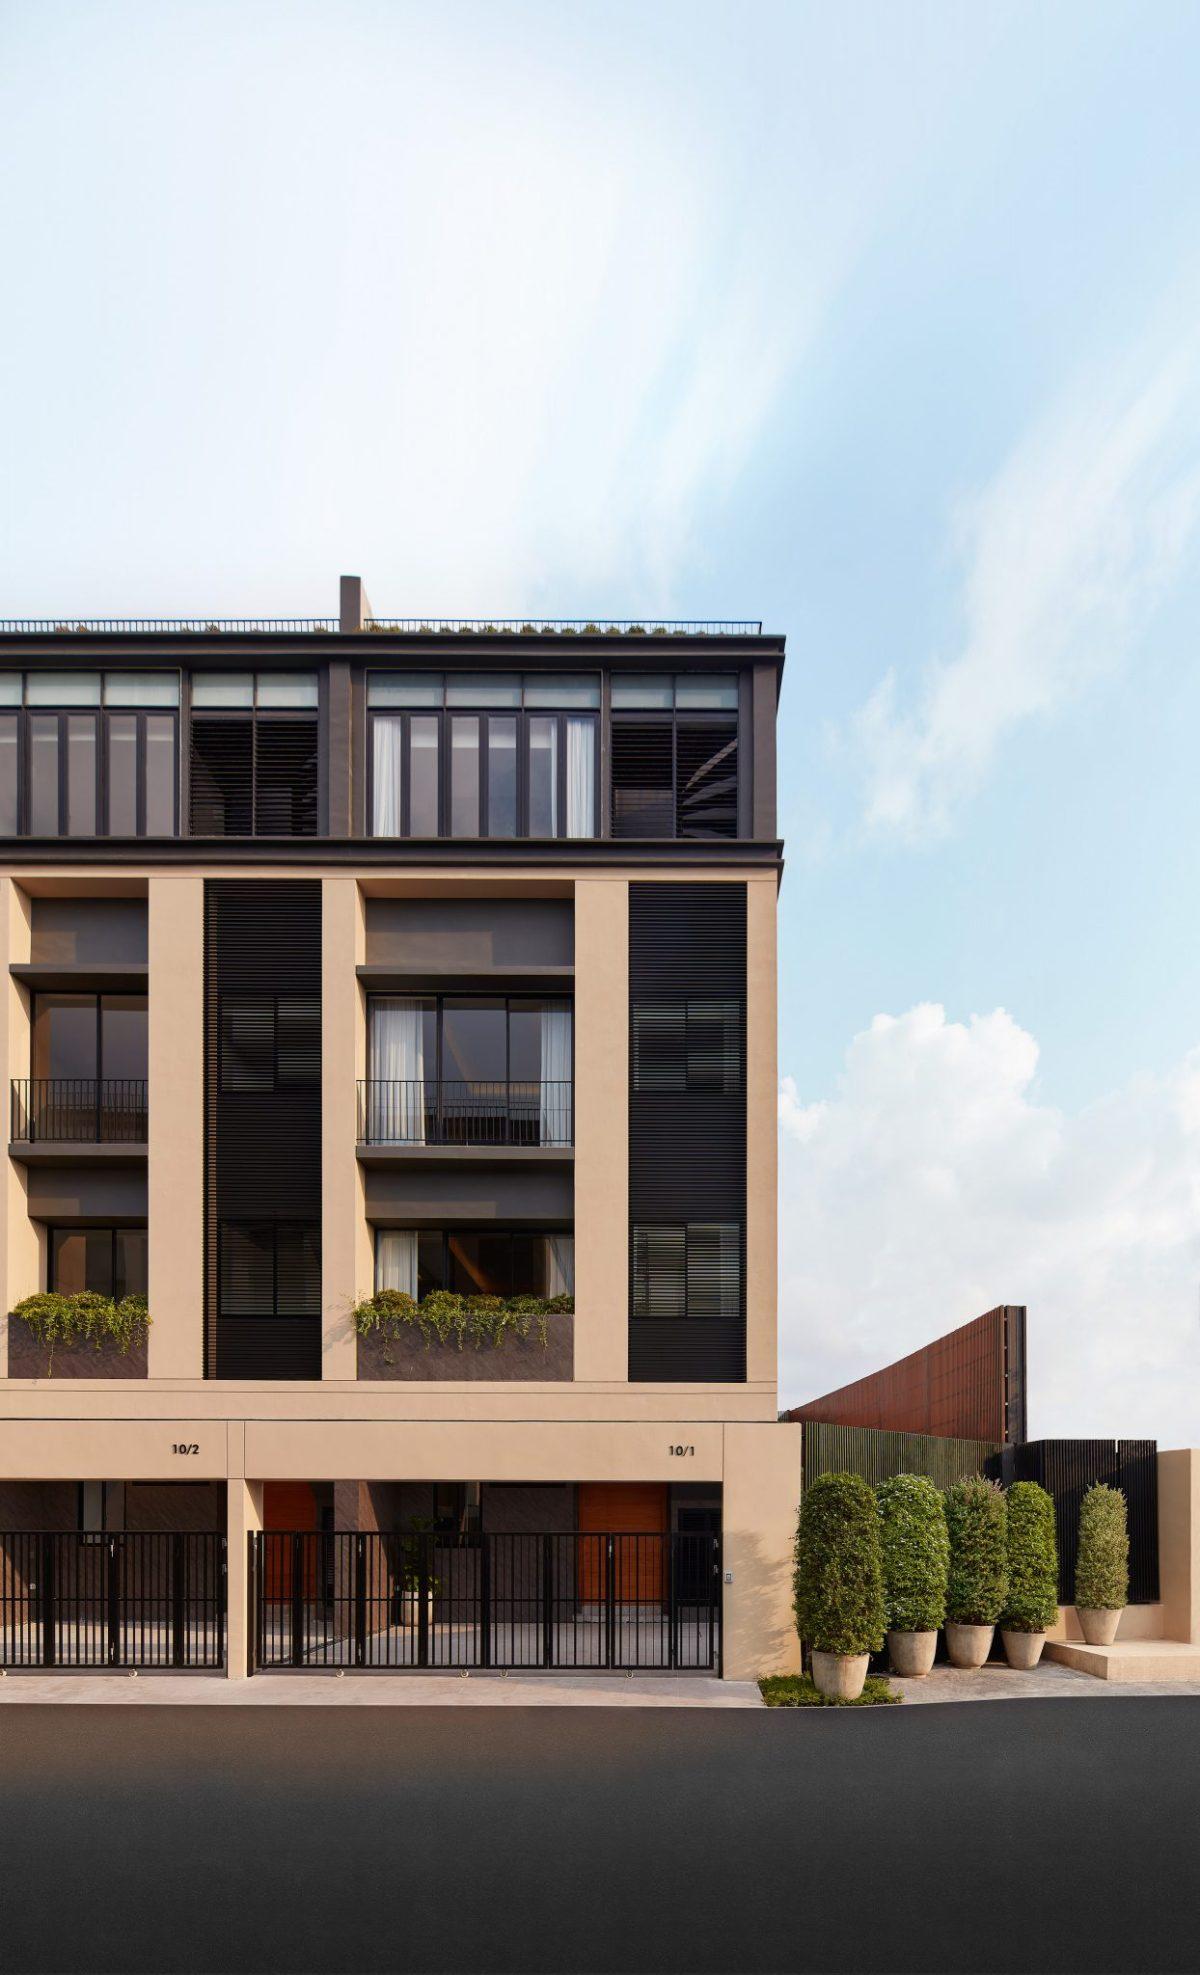 AIRES RAMA9 รีวิว Luxury Townhome 3.5 ชั้น + Rooftop ออกแบบสวย ย่านพระราม9 (ใกล้ รพ.สมิติเวช) 17 - AIRES